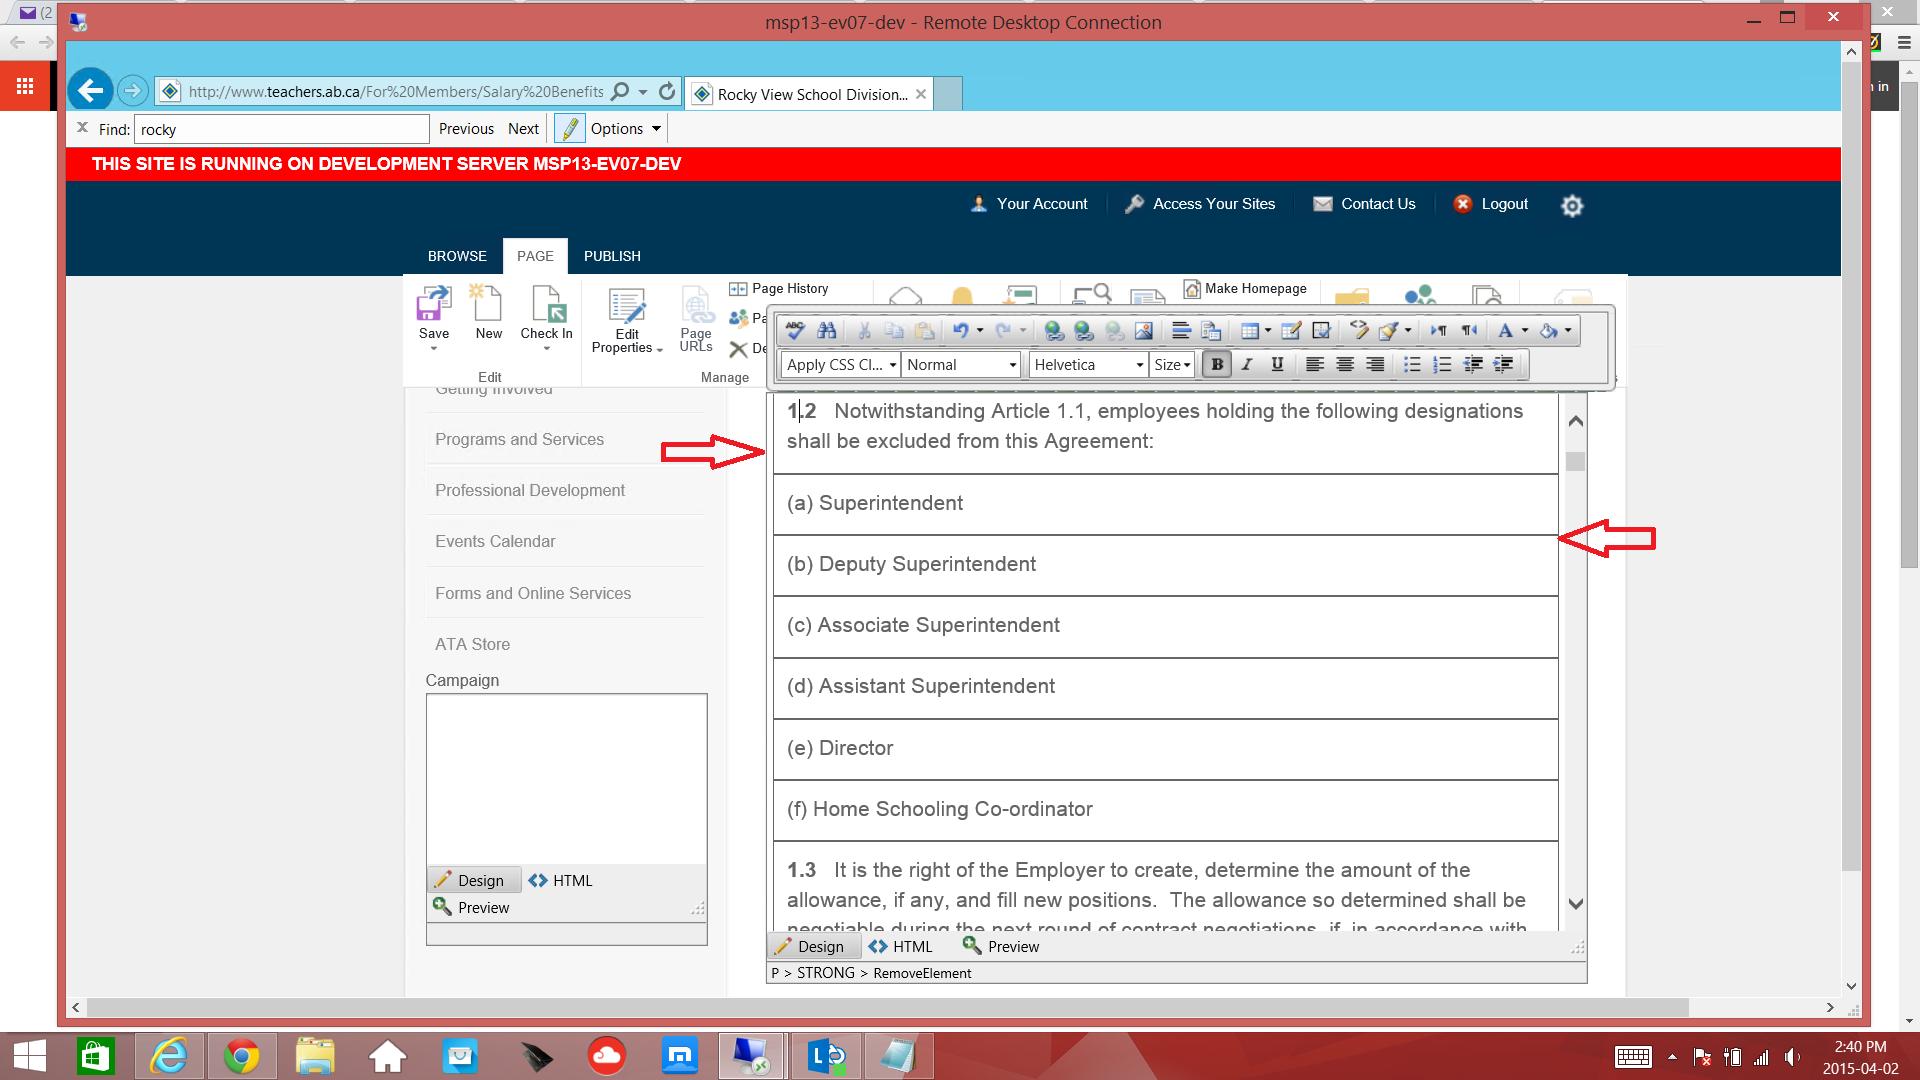 RADEditor issues - cursor jumps to bottom of editor window